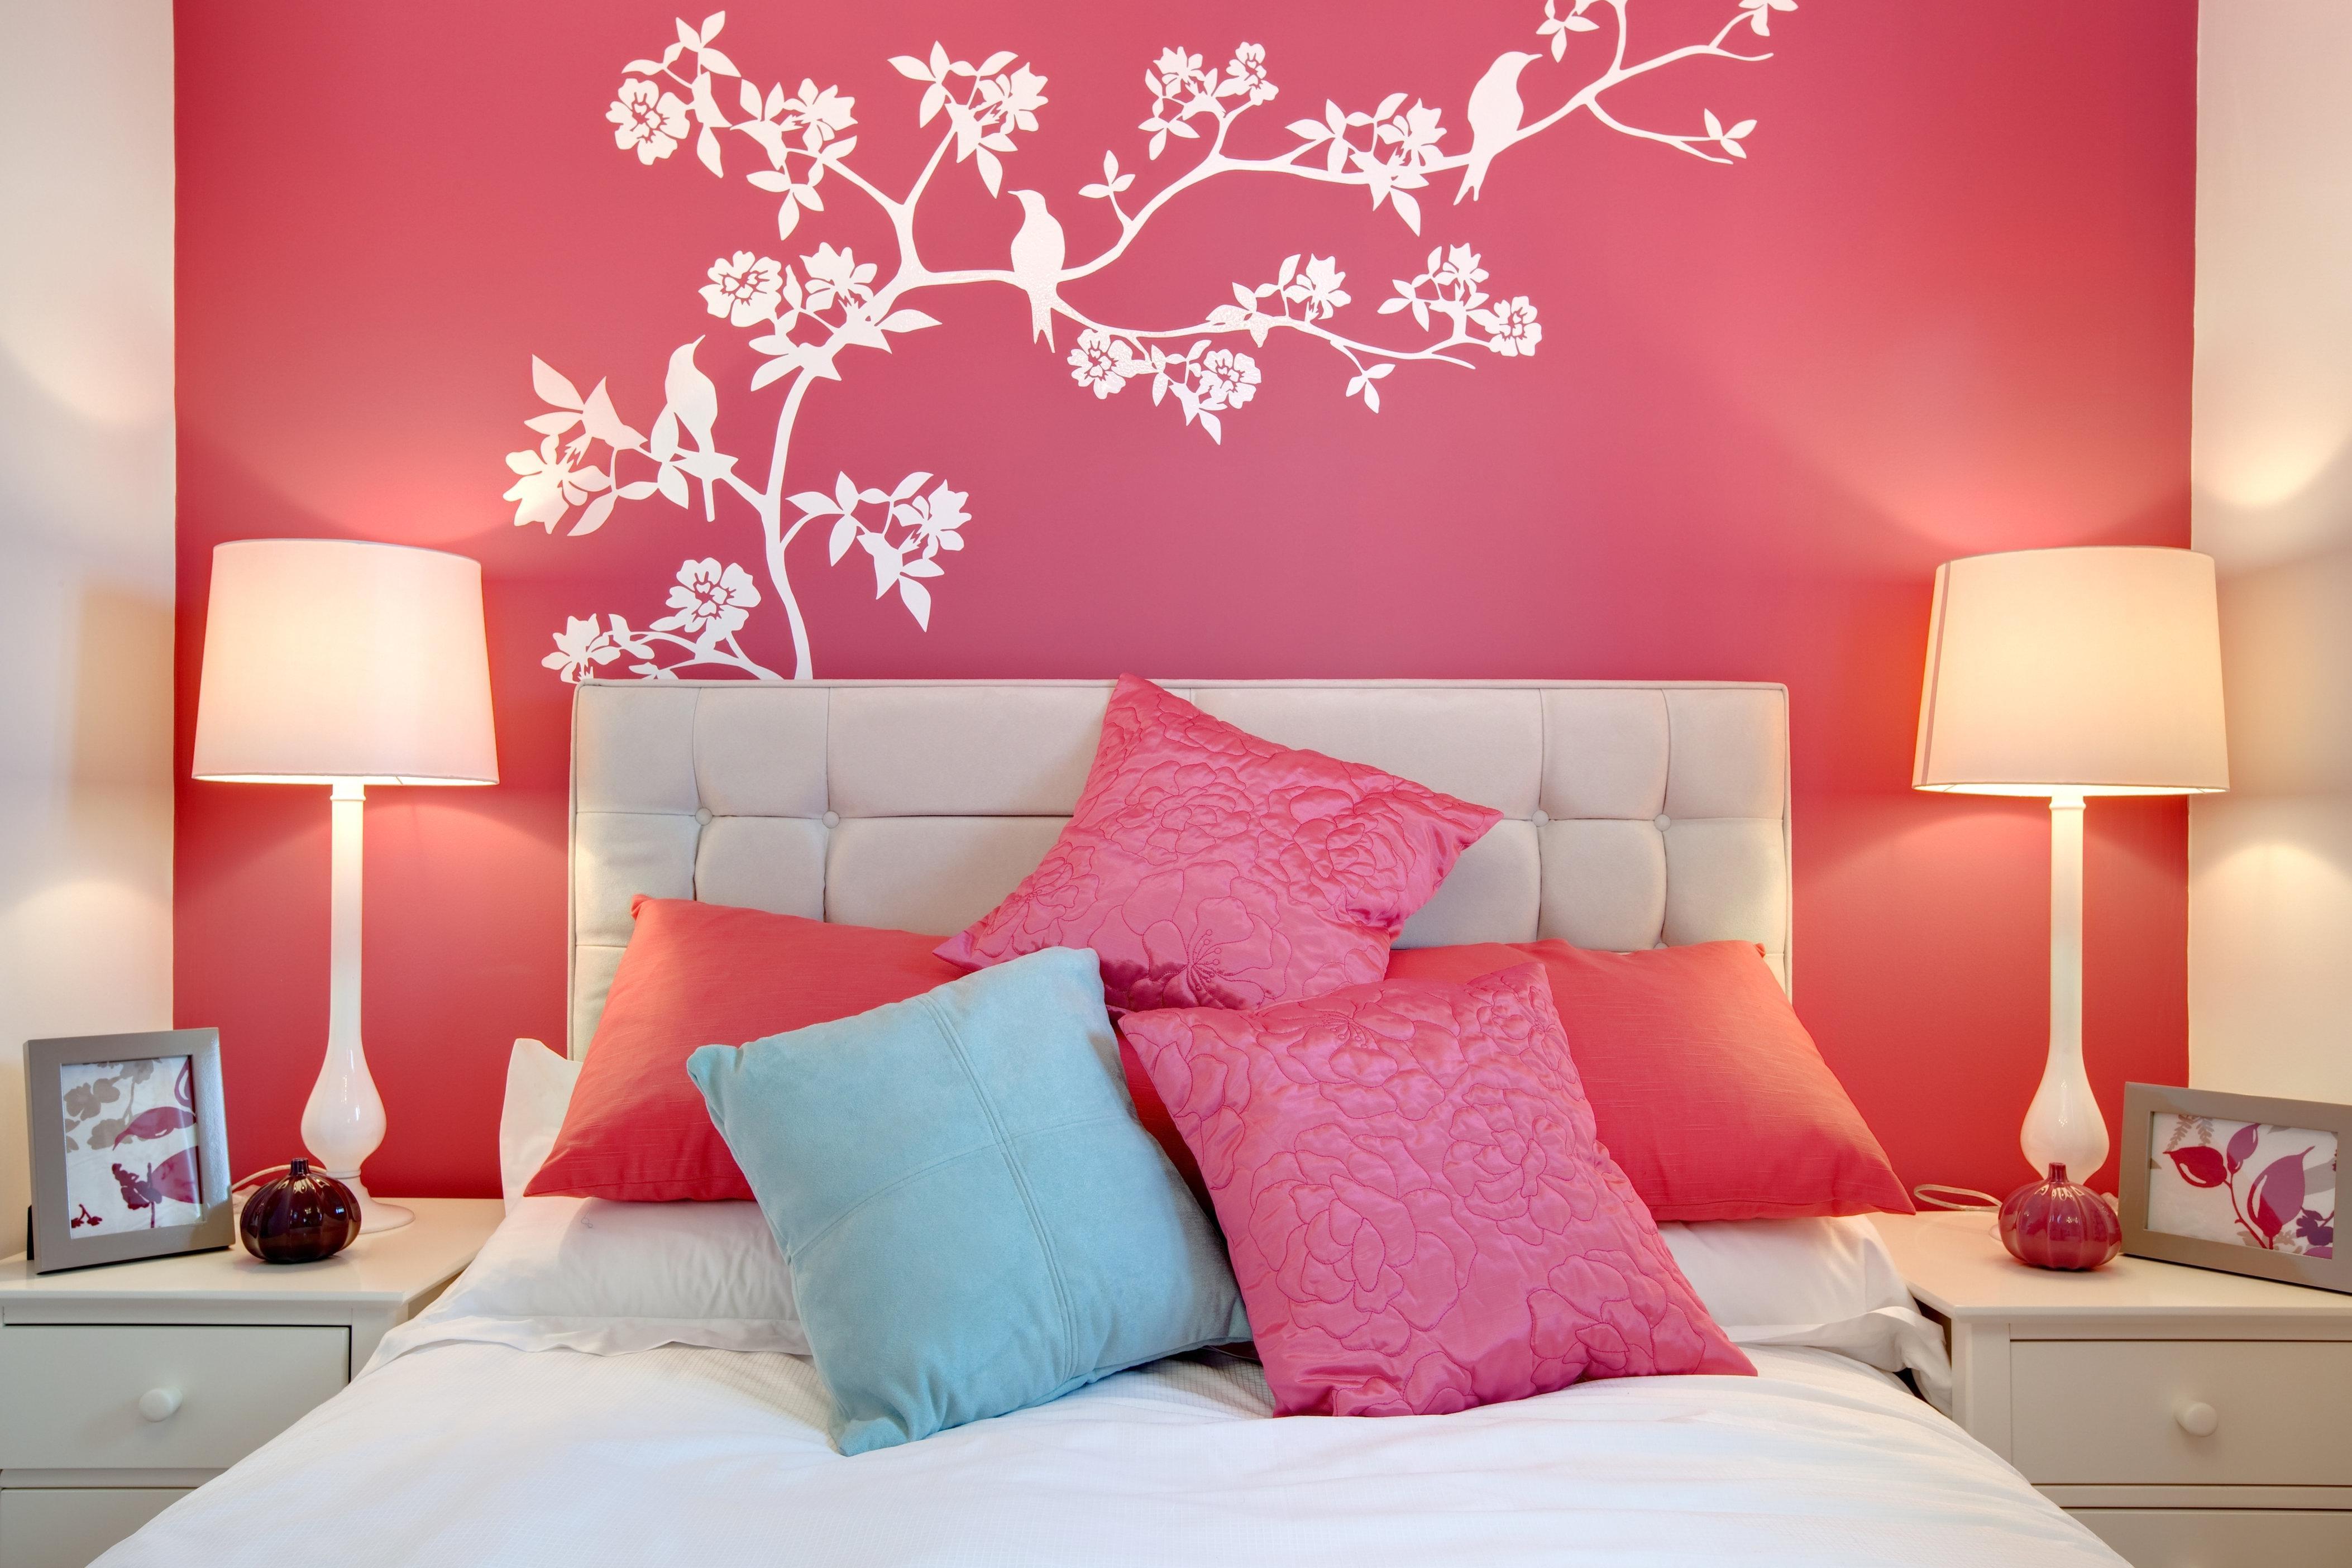 bedroom color design online Bedroom Colour Design Home Inspiration How To Redesign Your Scheme  2808 X 4212